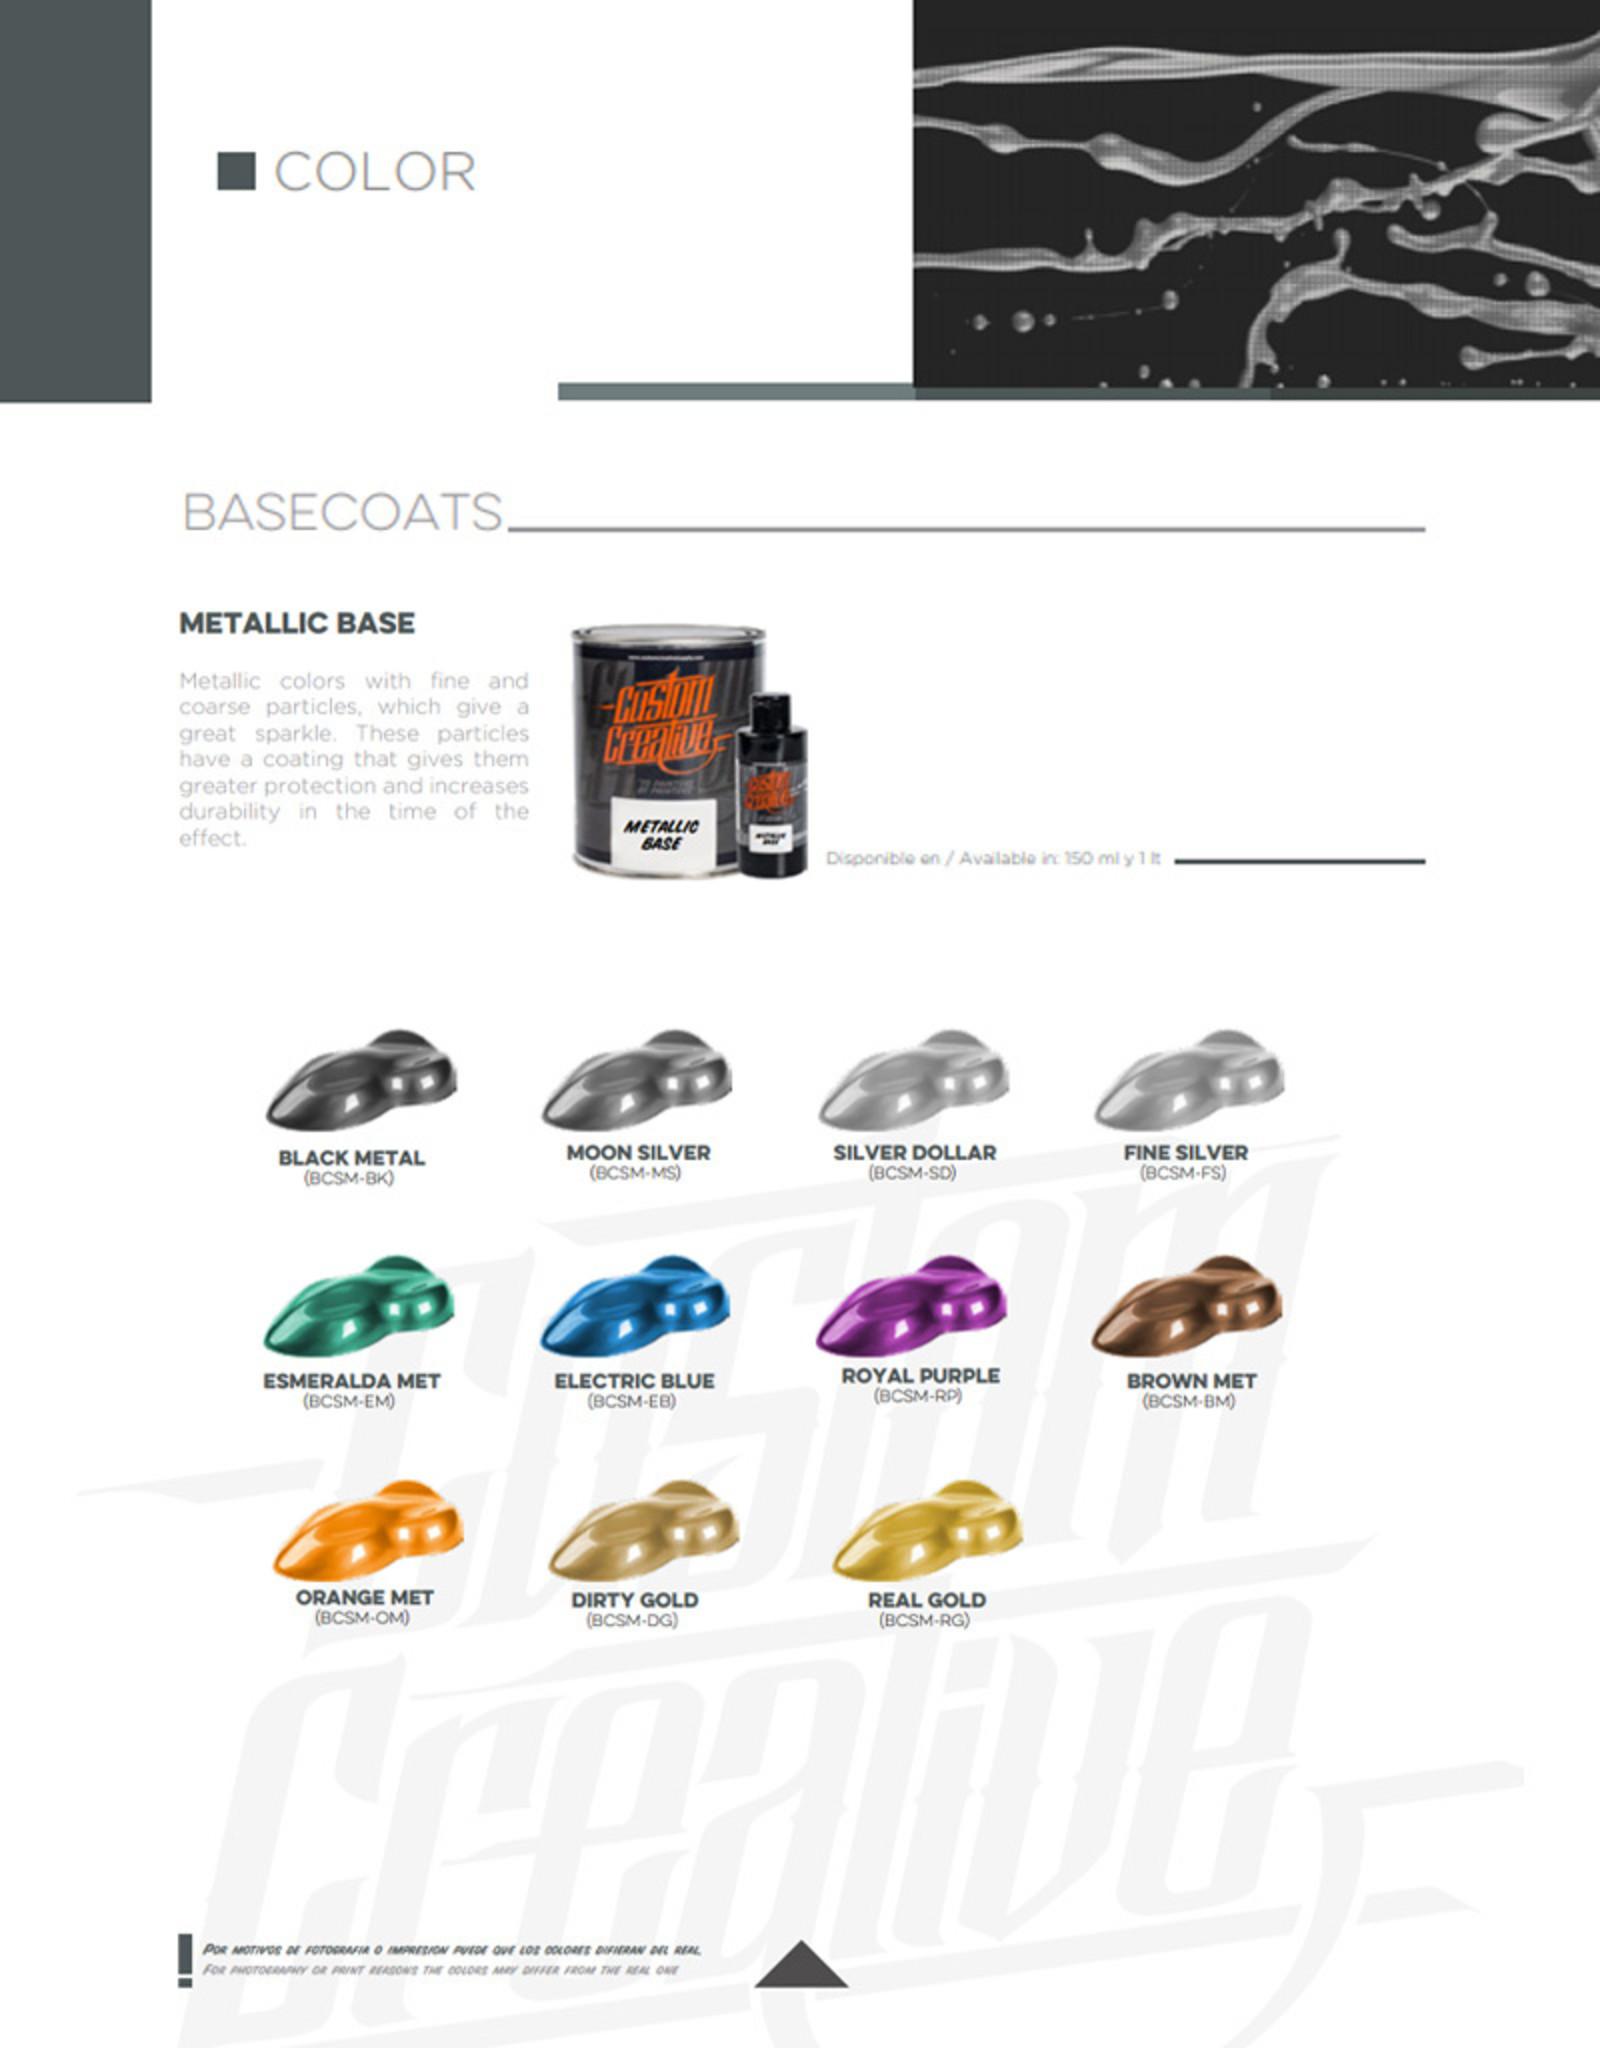 Custom Creative Custom Creative Base Color Metallic - Esmeralda Met